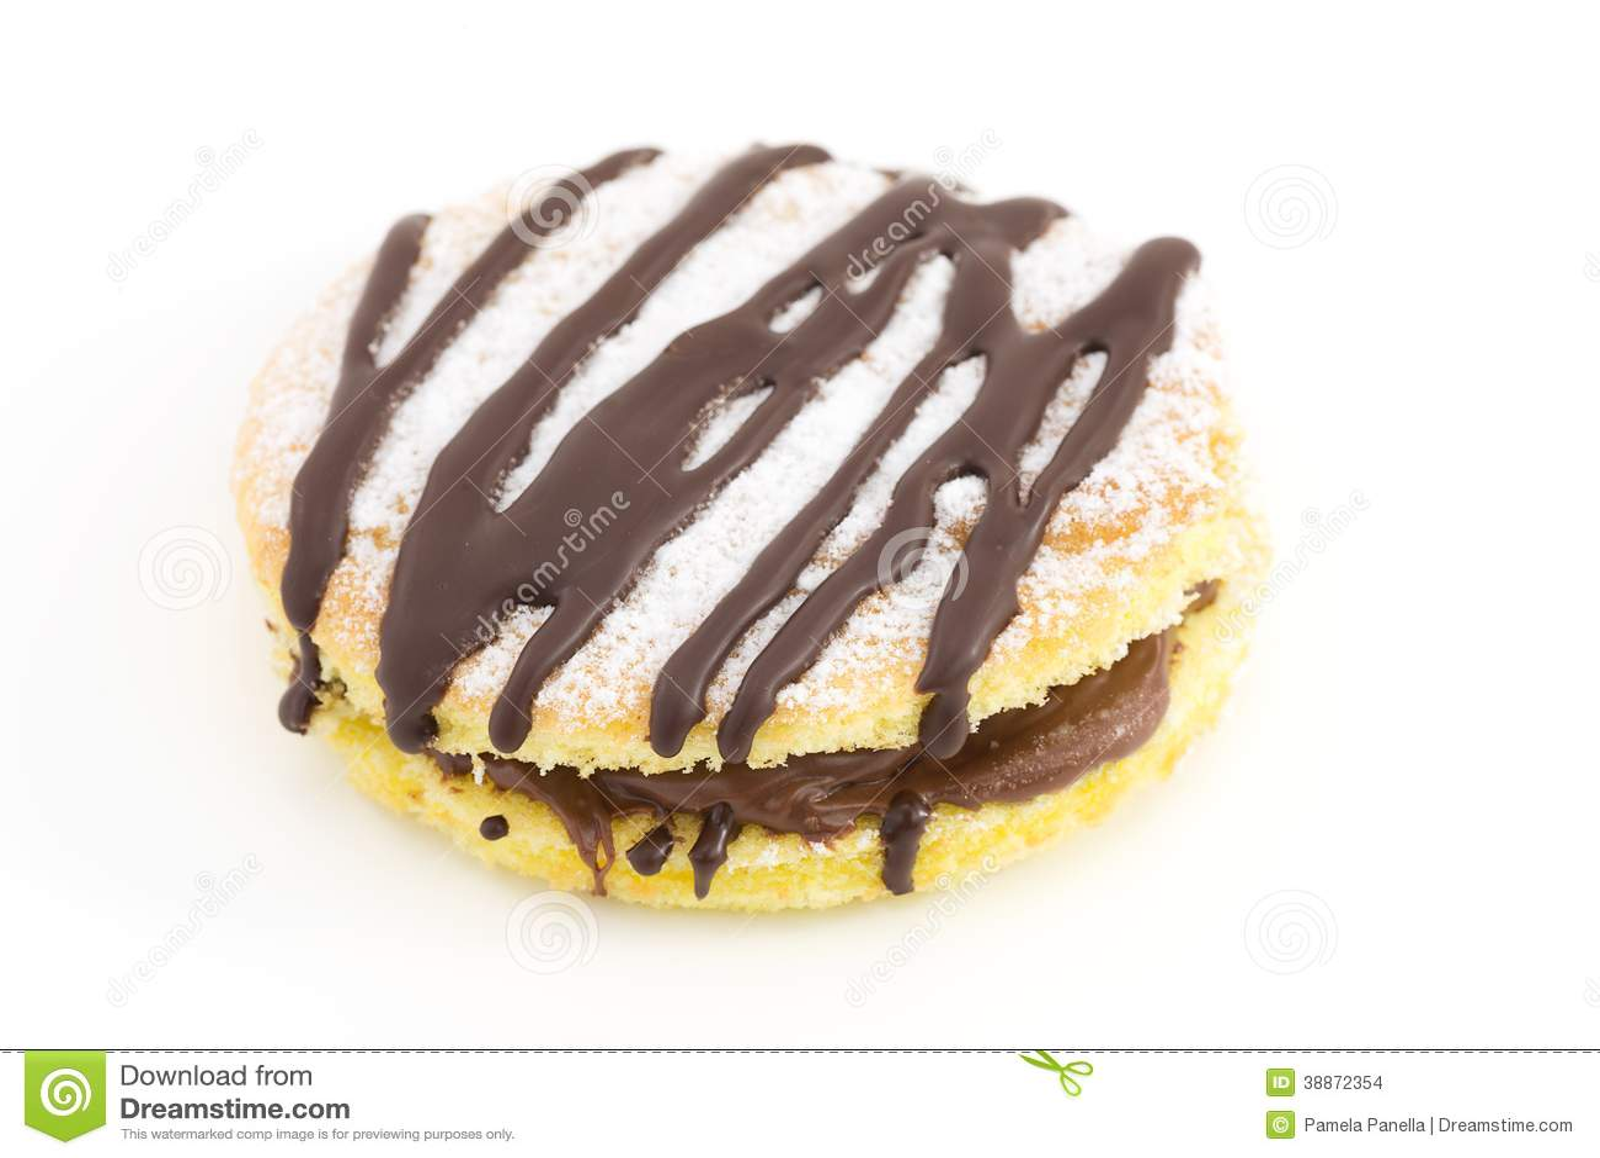 Snacks Chocolate